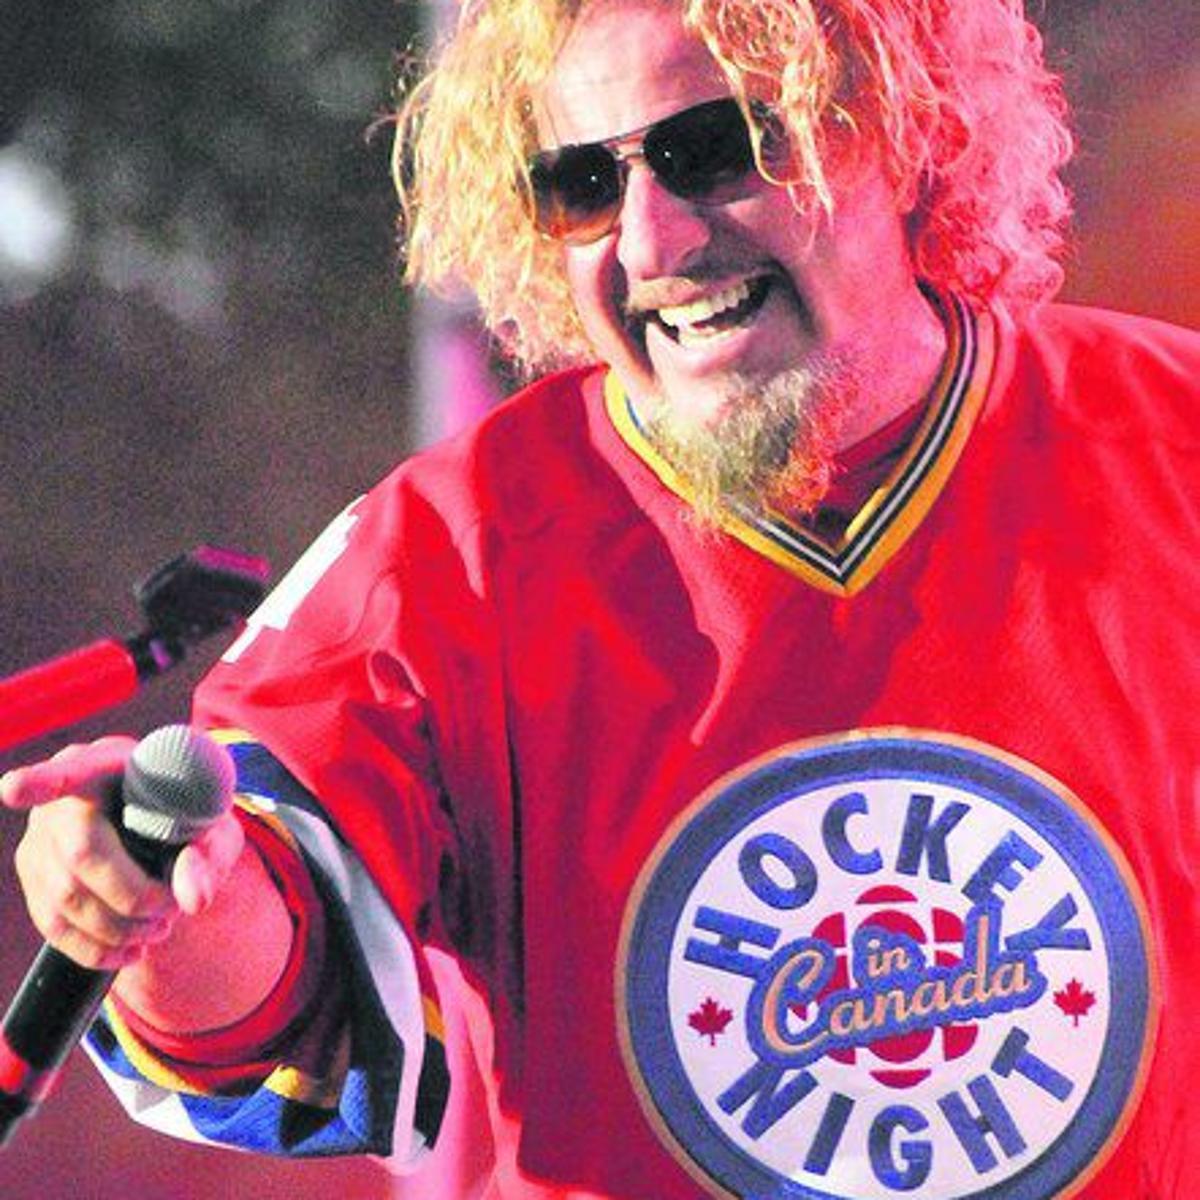 Jennings Sammy Hagar Foreigner Make For Rockin Tuesdays Night And Day Niagara Gazette Com